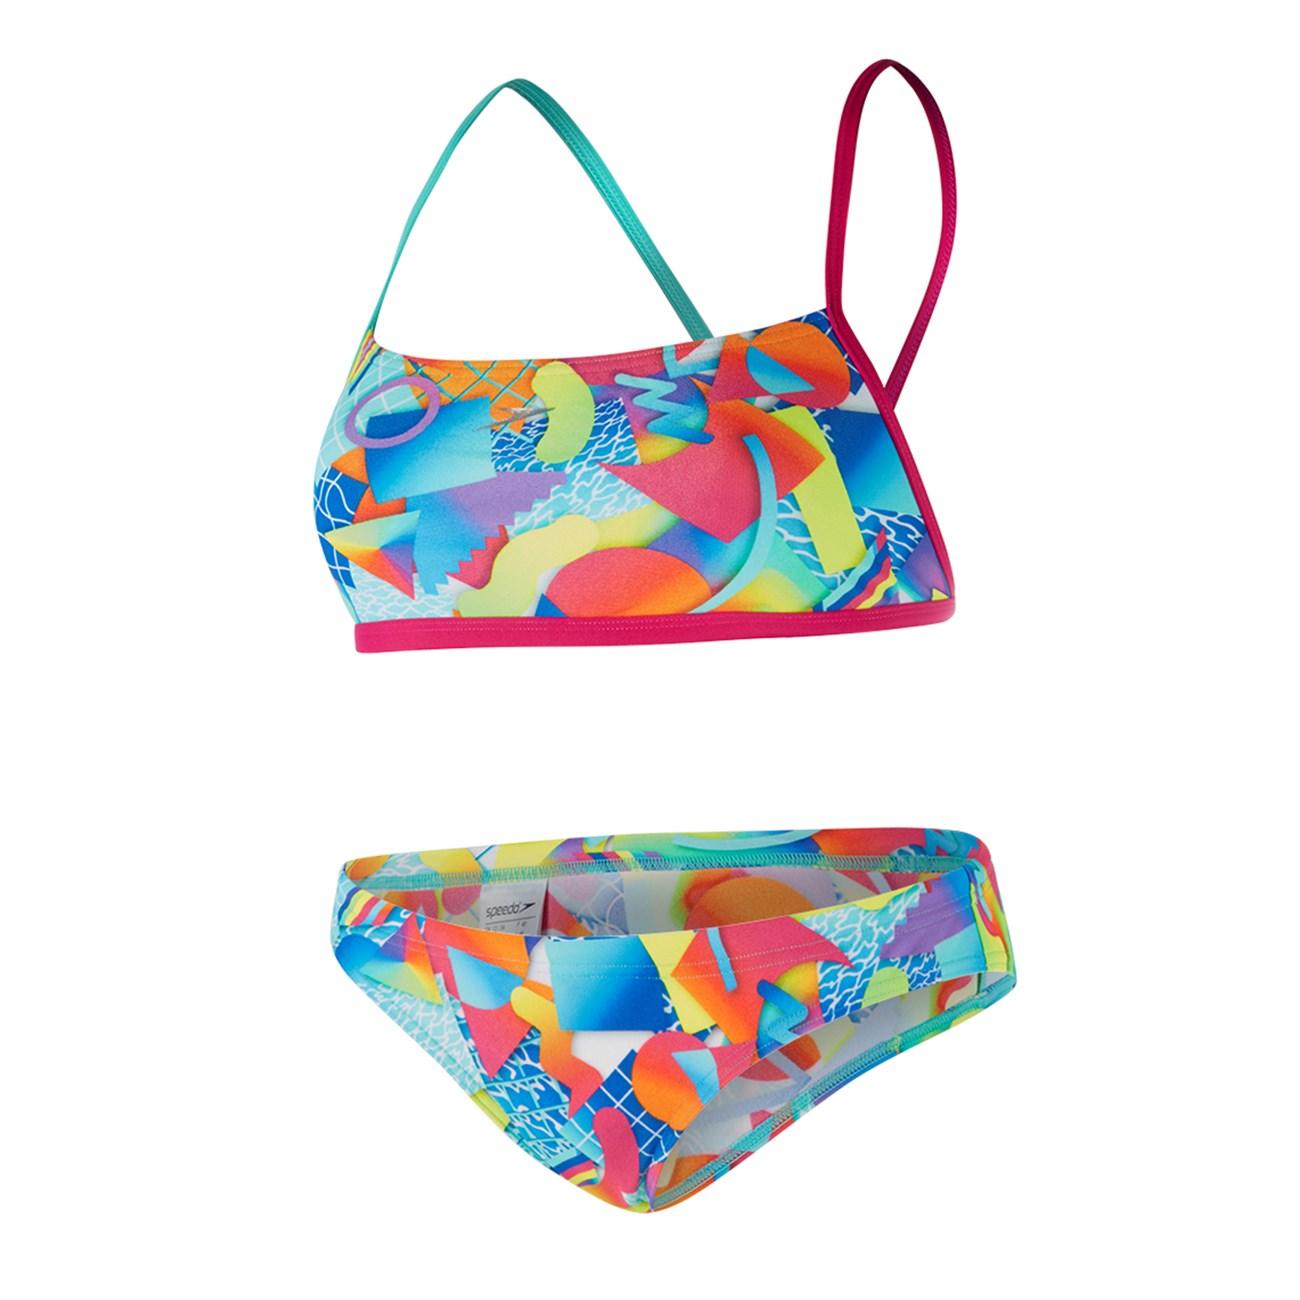 de9060418a3 SPEEDO Spectrum Splash 2 Piece Crossback < Μαγιό Κολύμβησης | INTERSPORT